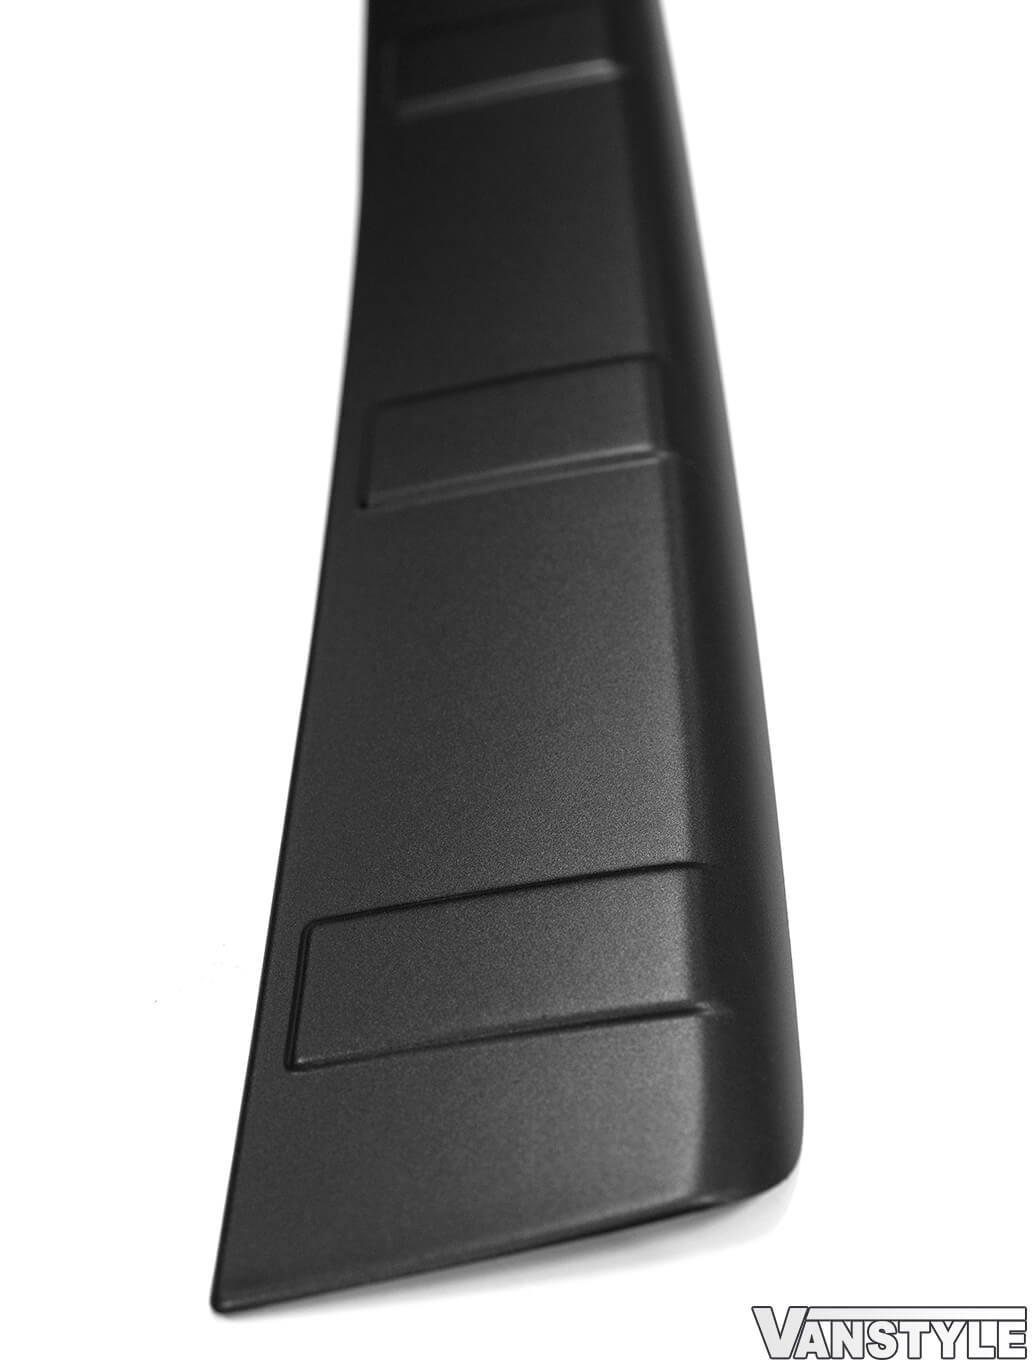 ABS Black Rear Bumper Protector - Berlingo/Partner/Combo 18>